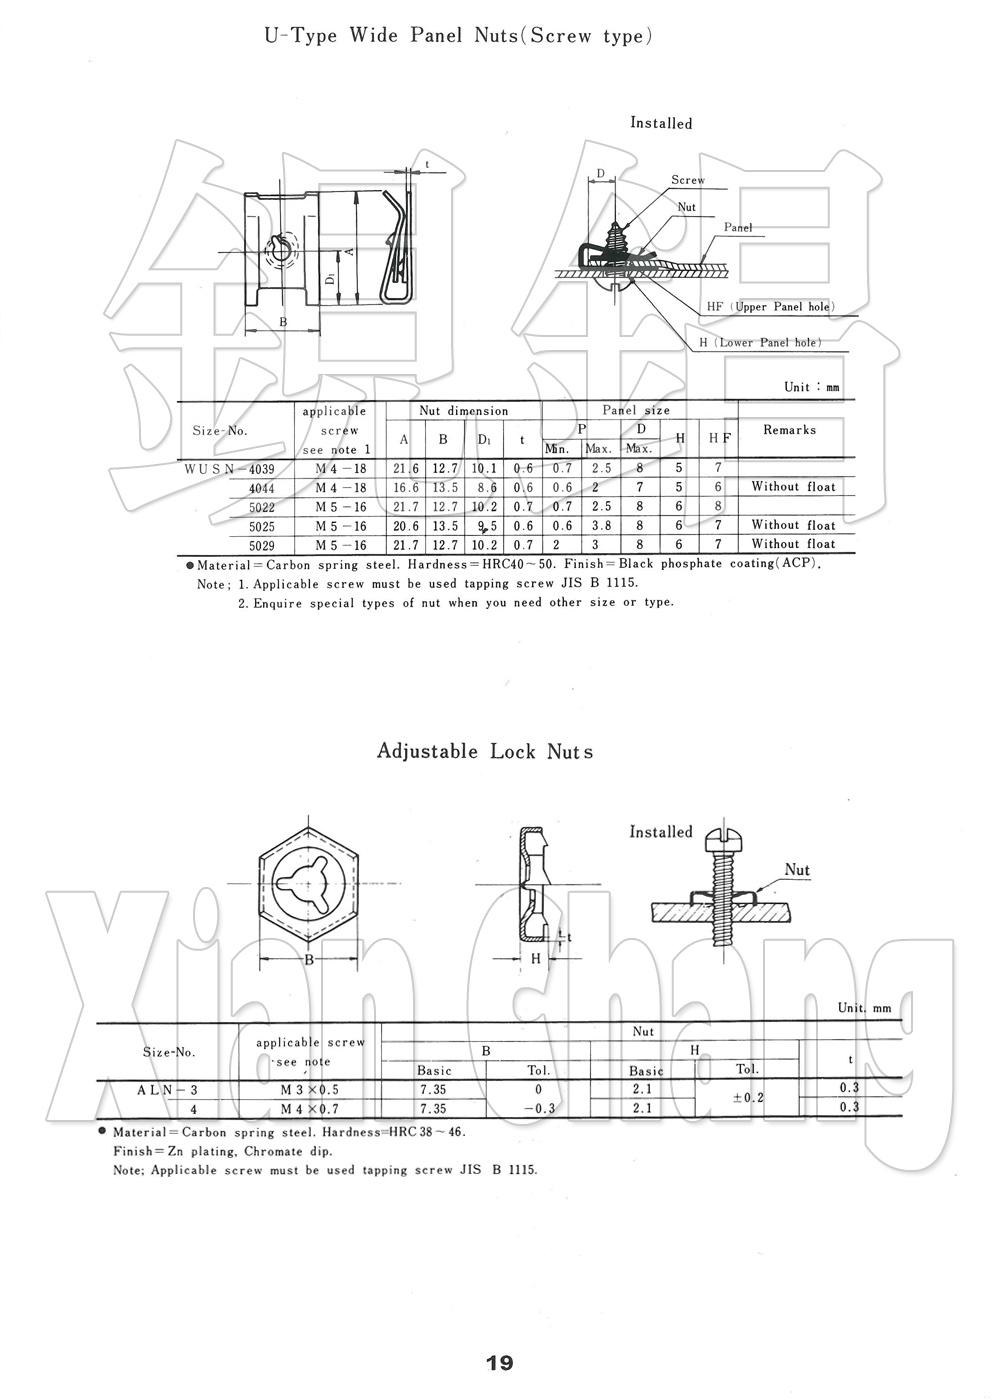 U-Type Wide Plate Nuts (Screw Type) U型寬板夾片螺母(螺釘型)